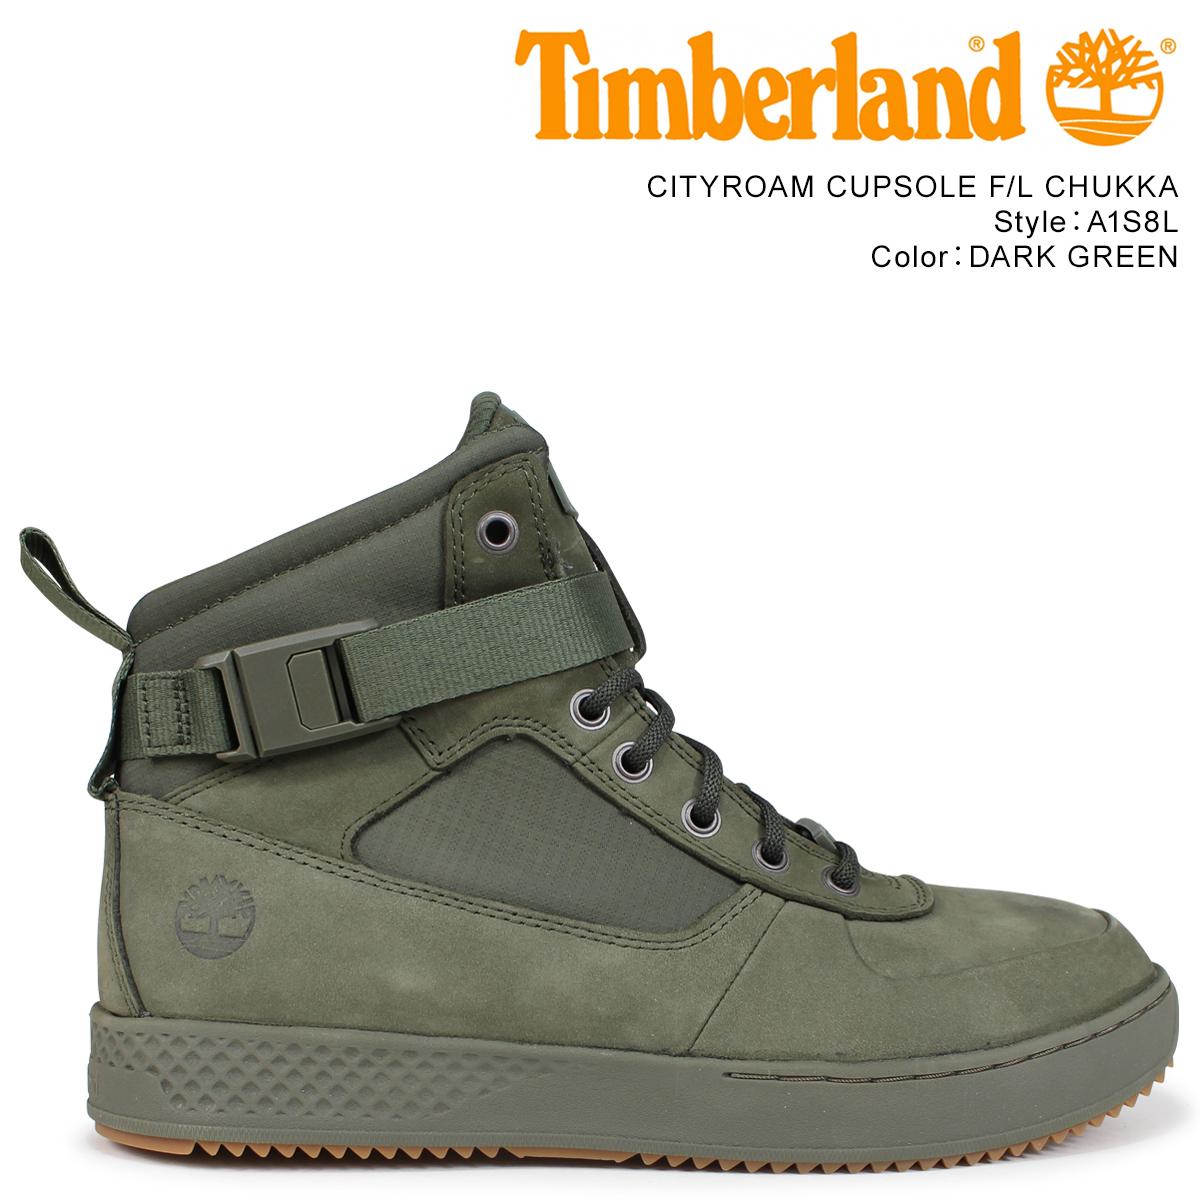 Timberland スニーカー ブーツ メンズ ティンバーランド CITYROAM CUPSOLE FL CHUKKA A1S8I Wワイズ グリーン